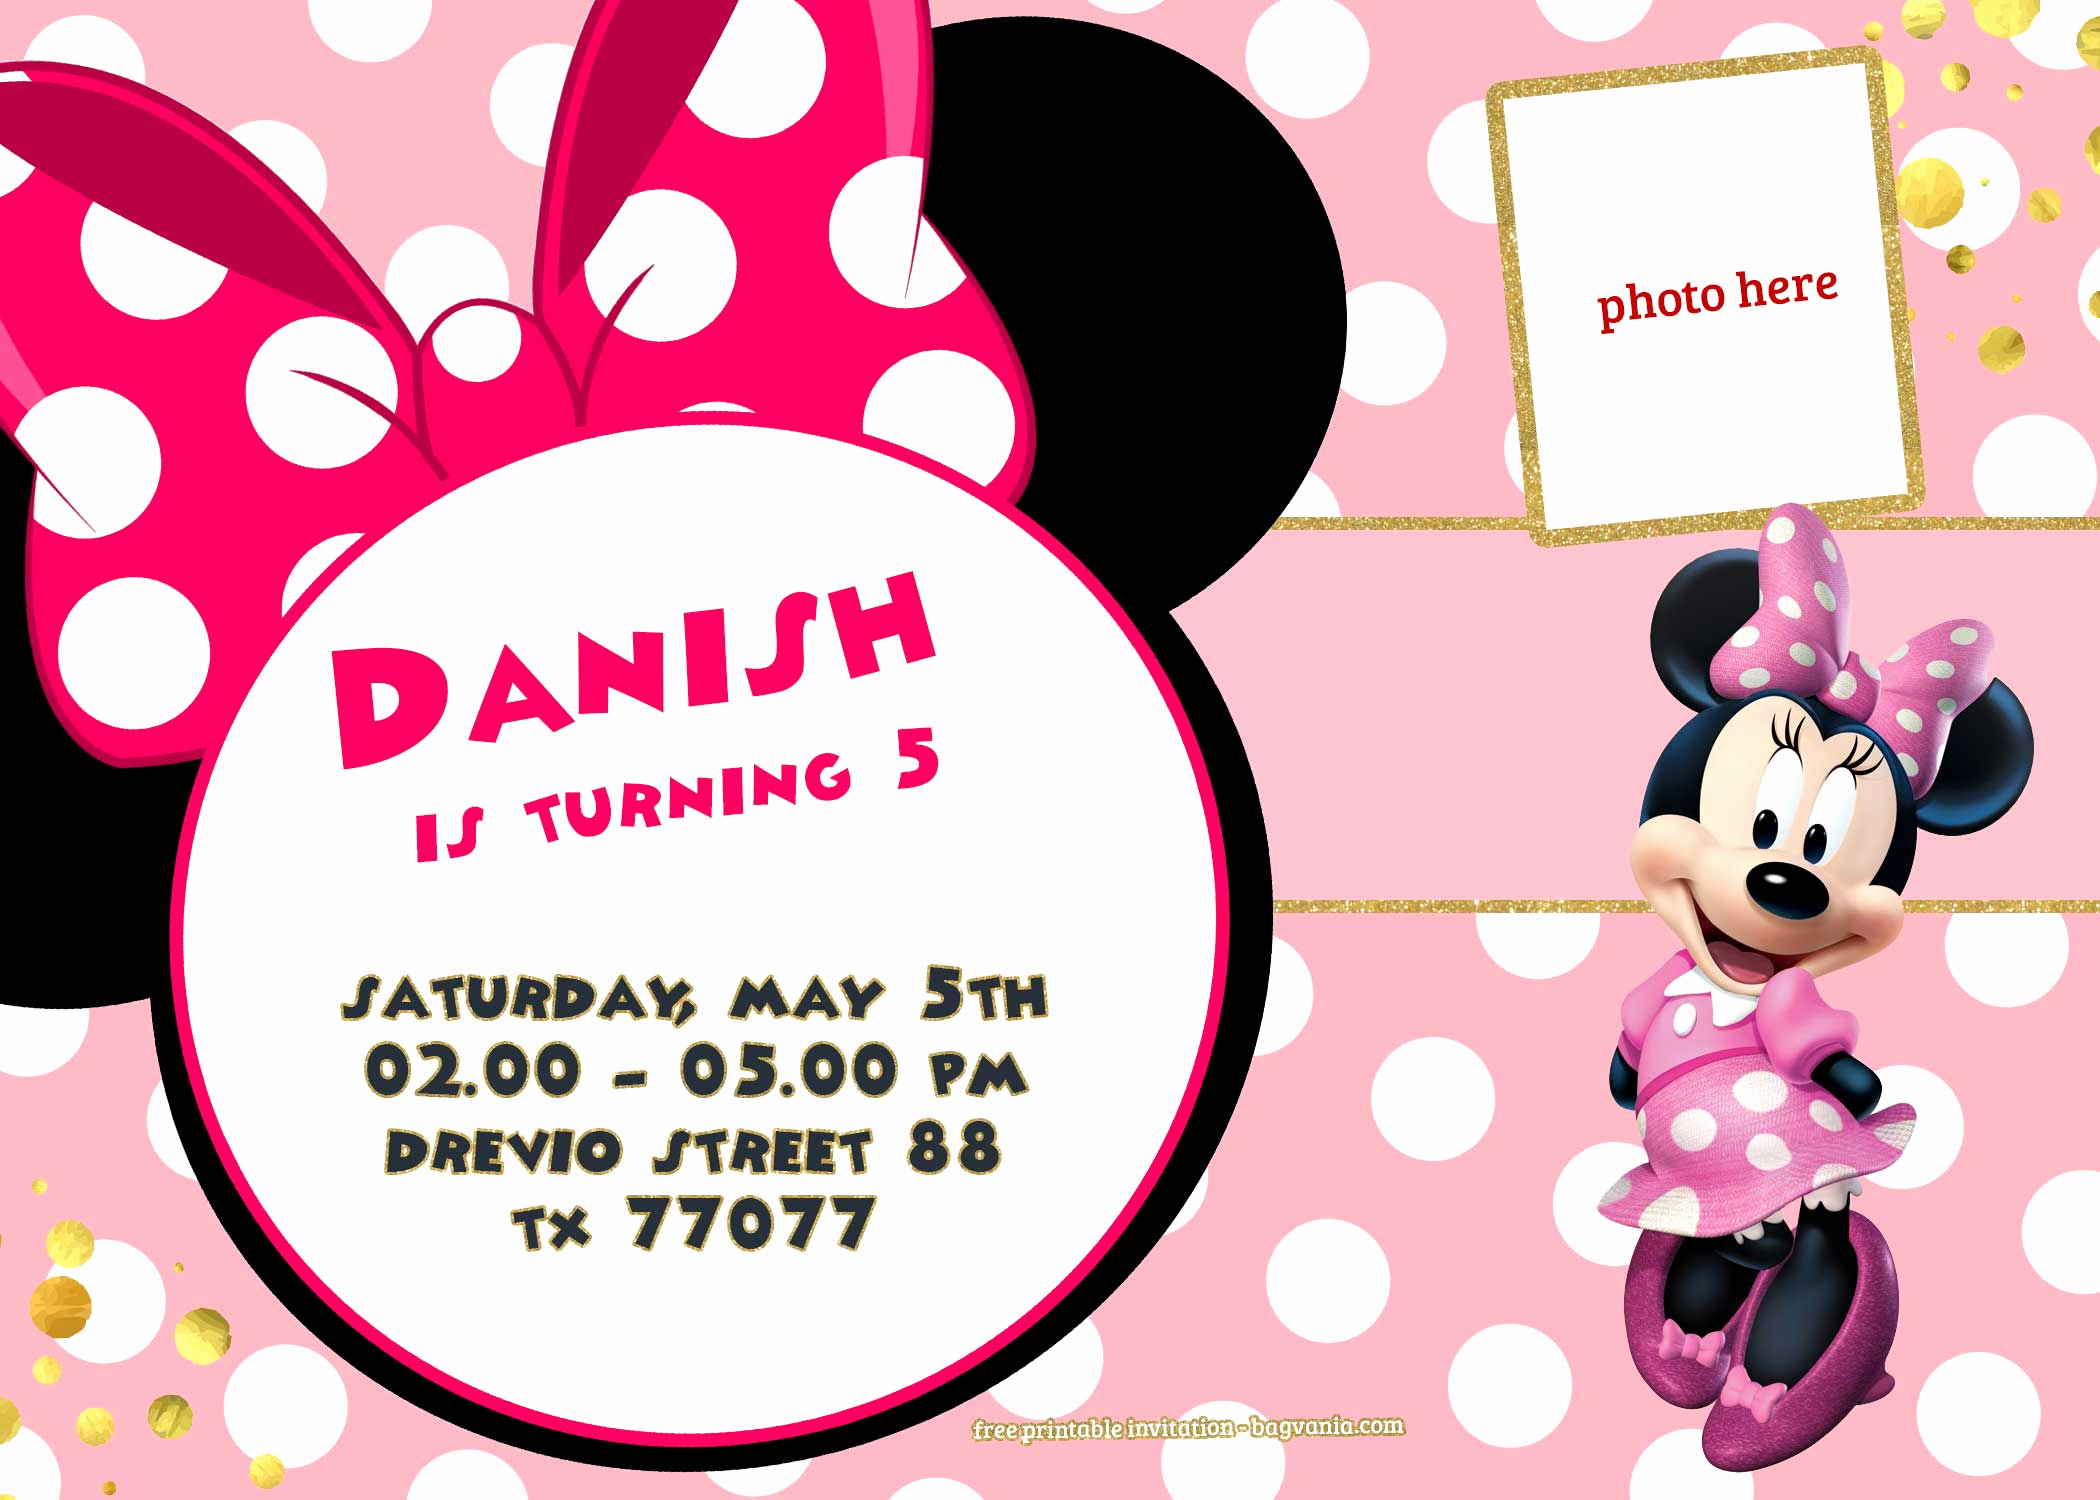 Minnie Mouse Invitation Template Free Elegant Free Printable Minnie Mouse Invitation Template – Polka